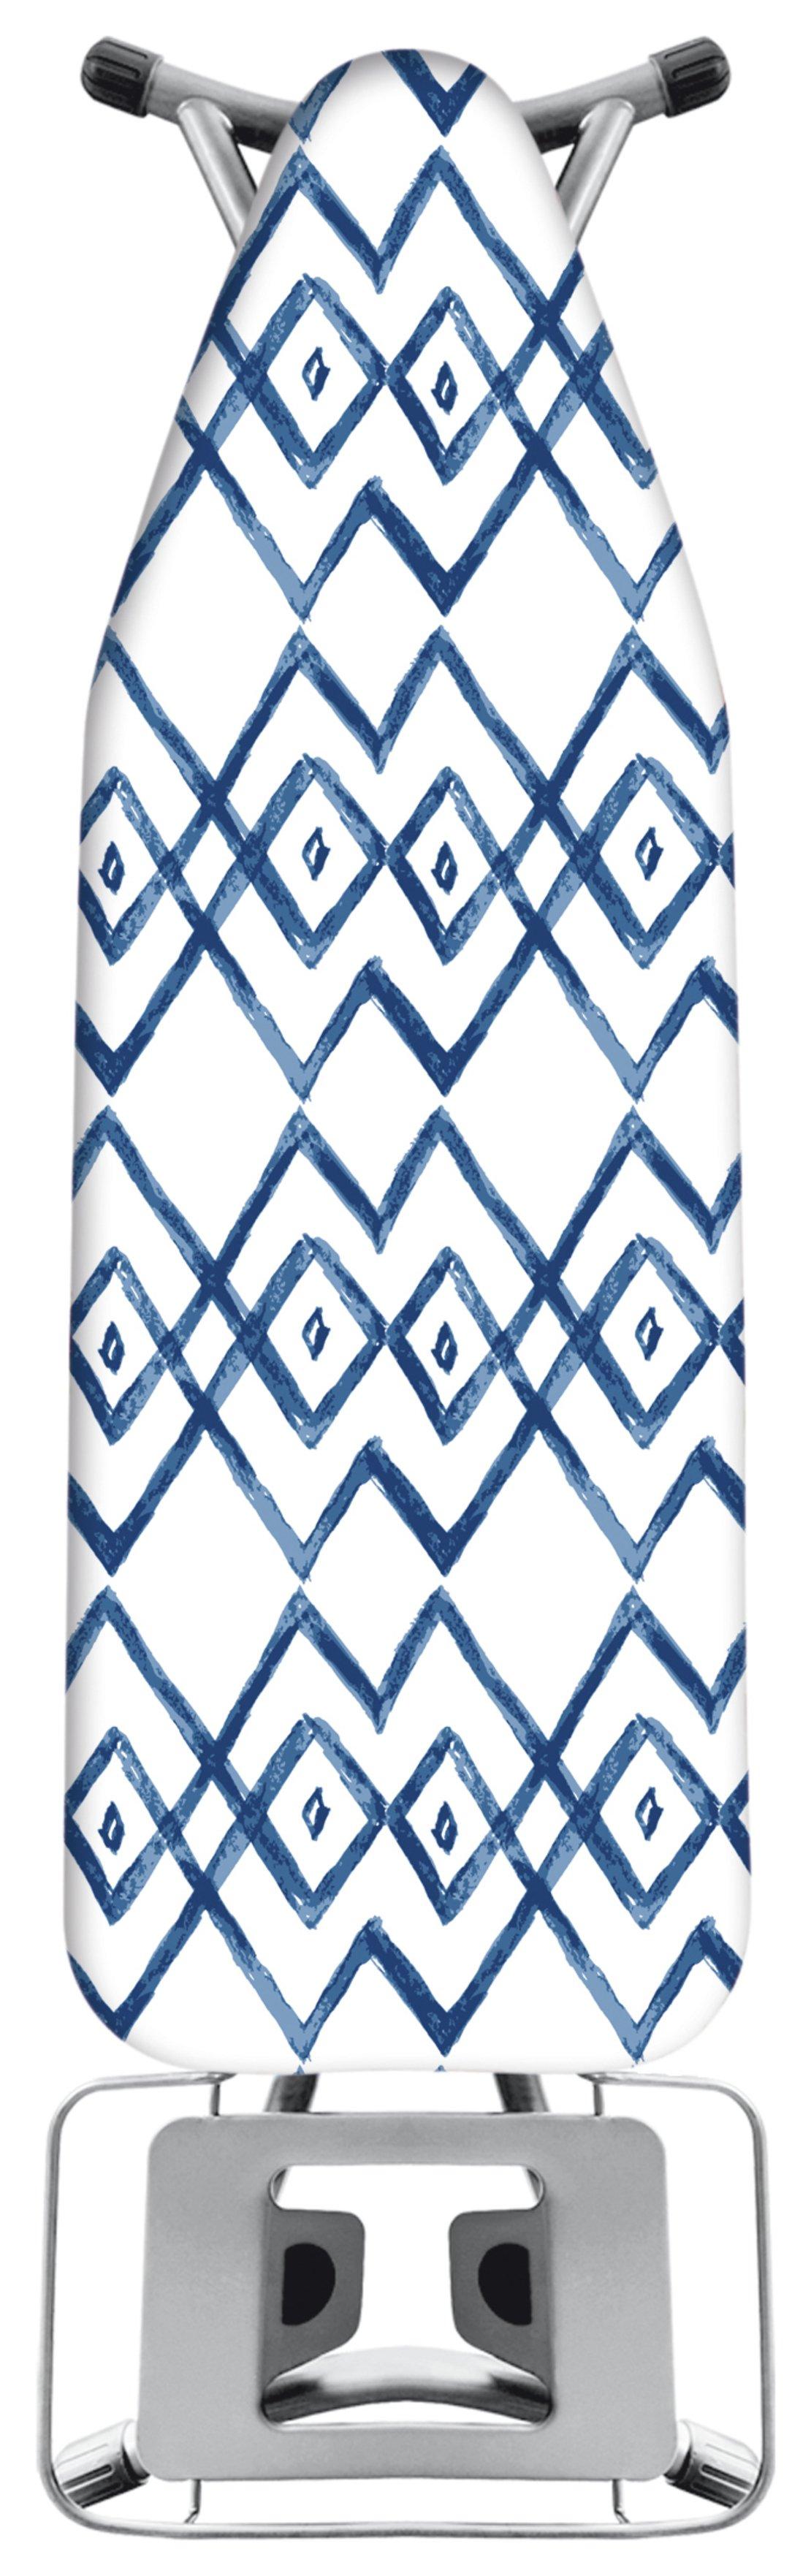 jml premium ironing board cover blue white. Black Bedroom Furniture Sets. Home Design Ideas